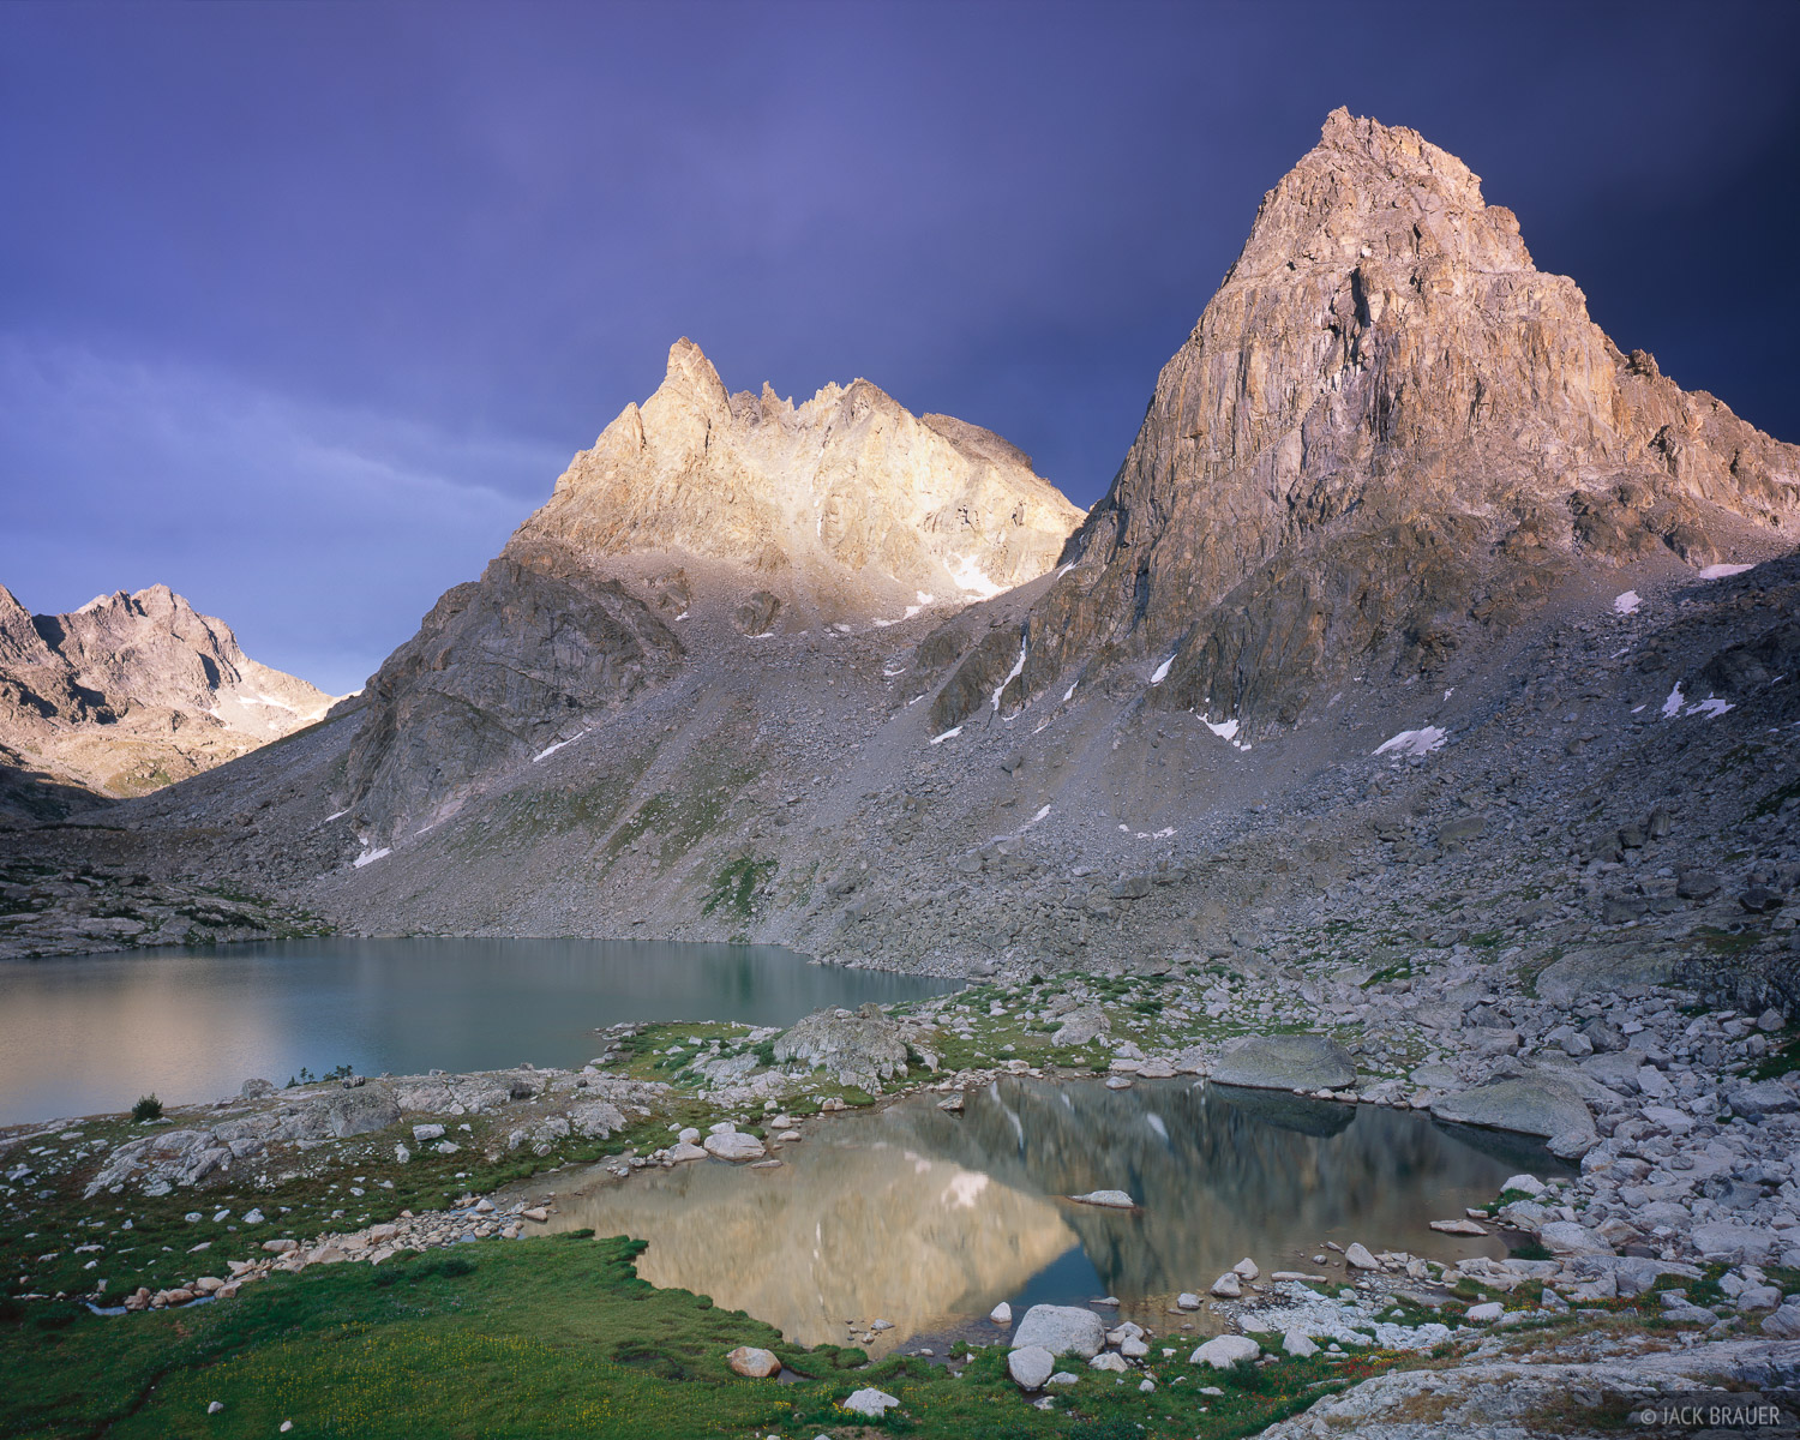 early sunset light on Sulphur Peak (left, 12,826 ft.) and Stroud Peak (right, 12,198 ft.) at Peak Lake - July